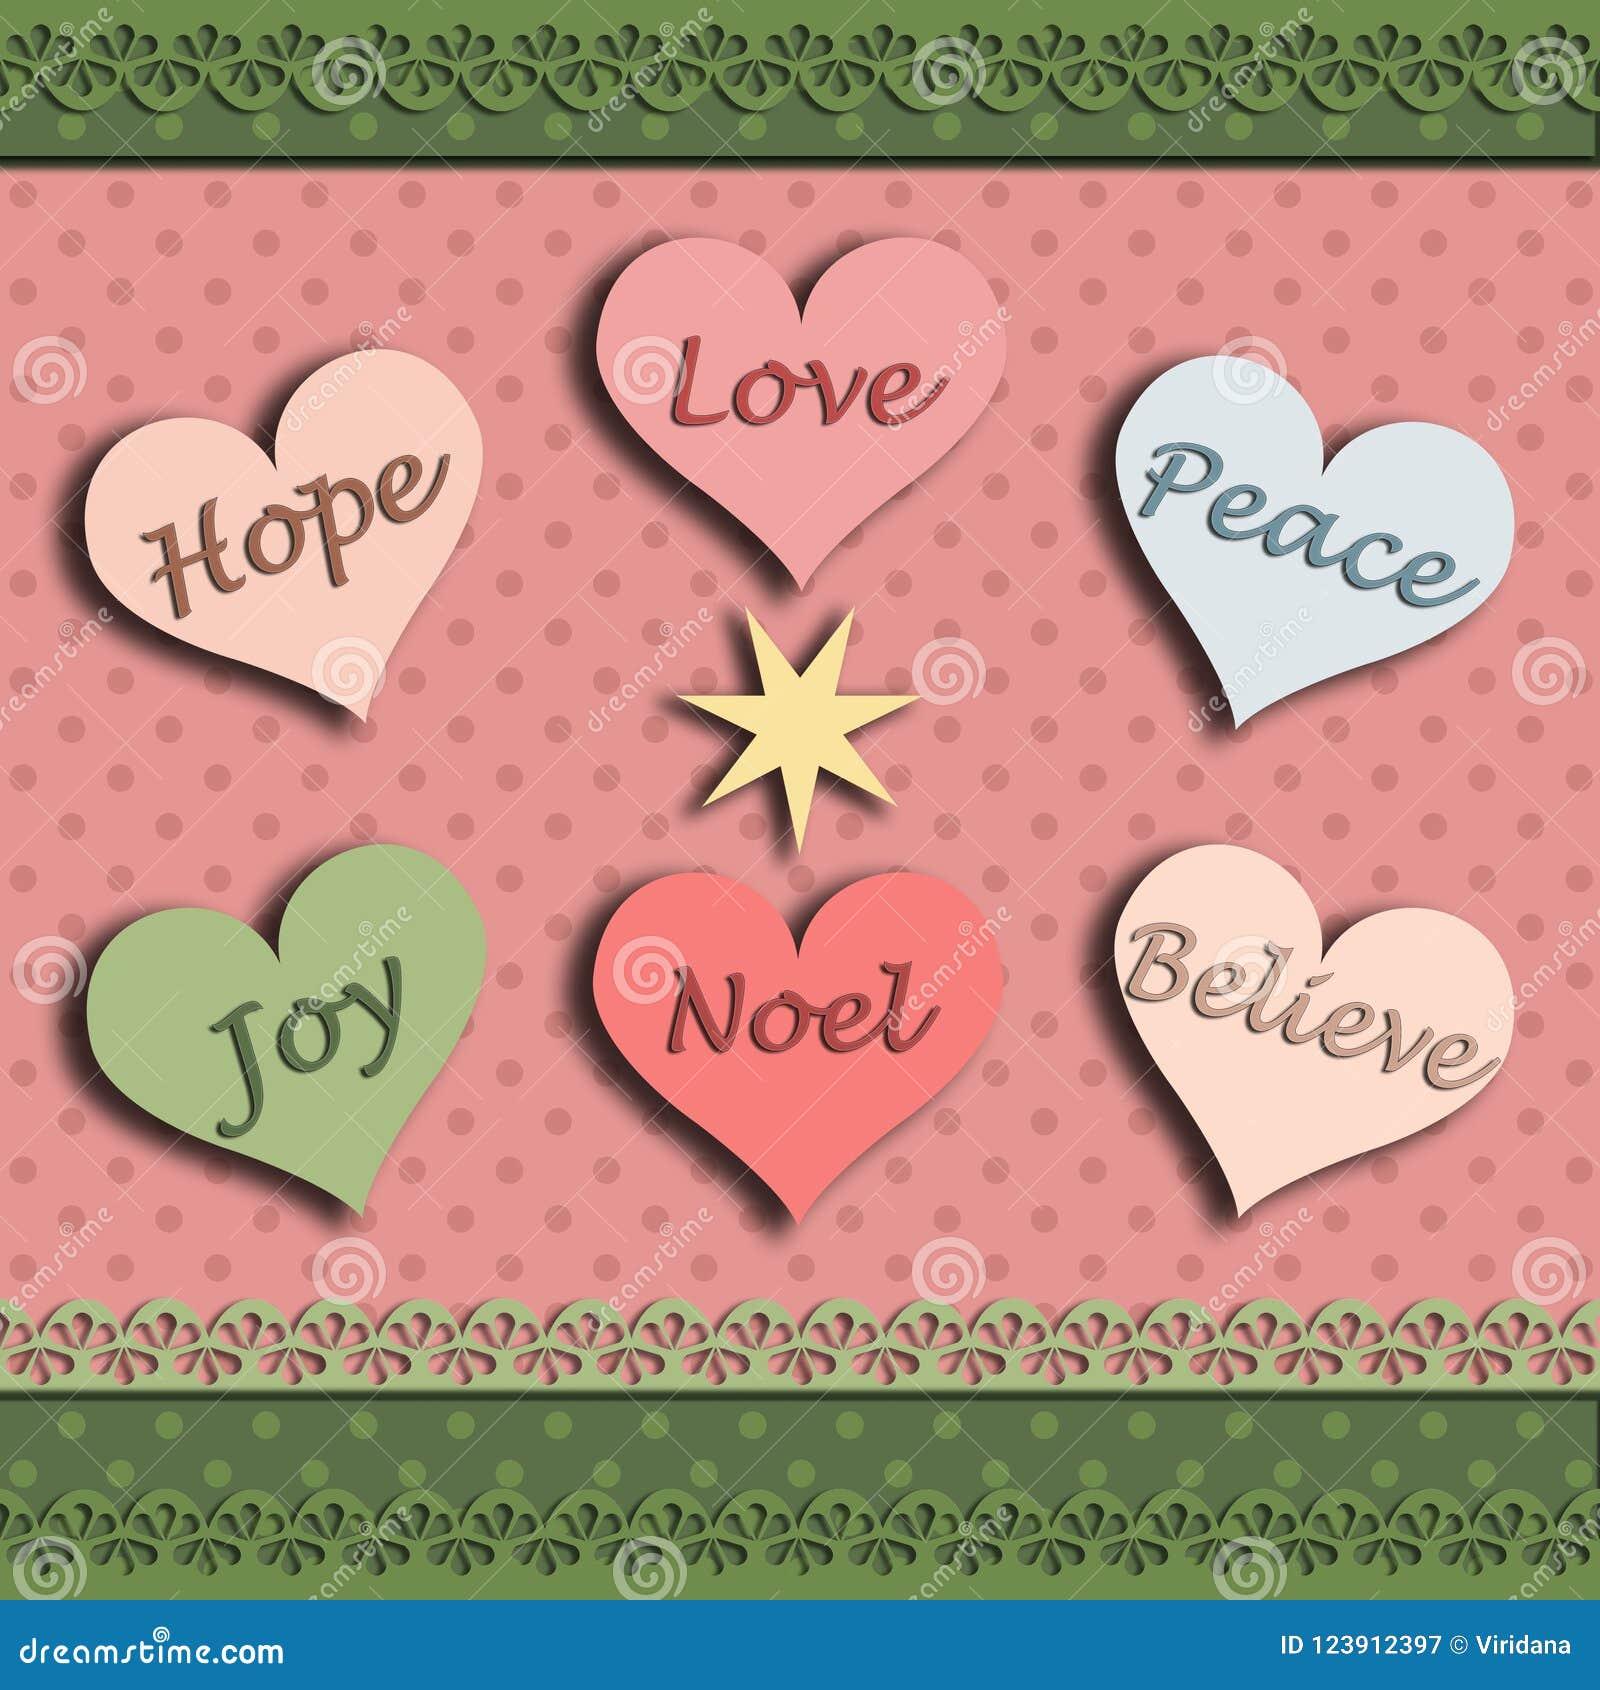 Christmas Card With The Word Hope Joy Love Believe Peace Noel Stock